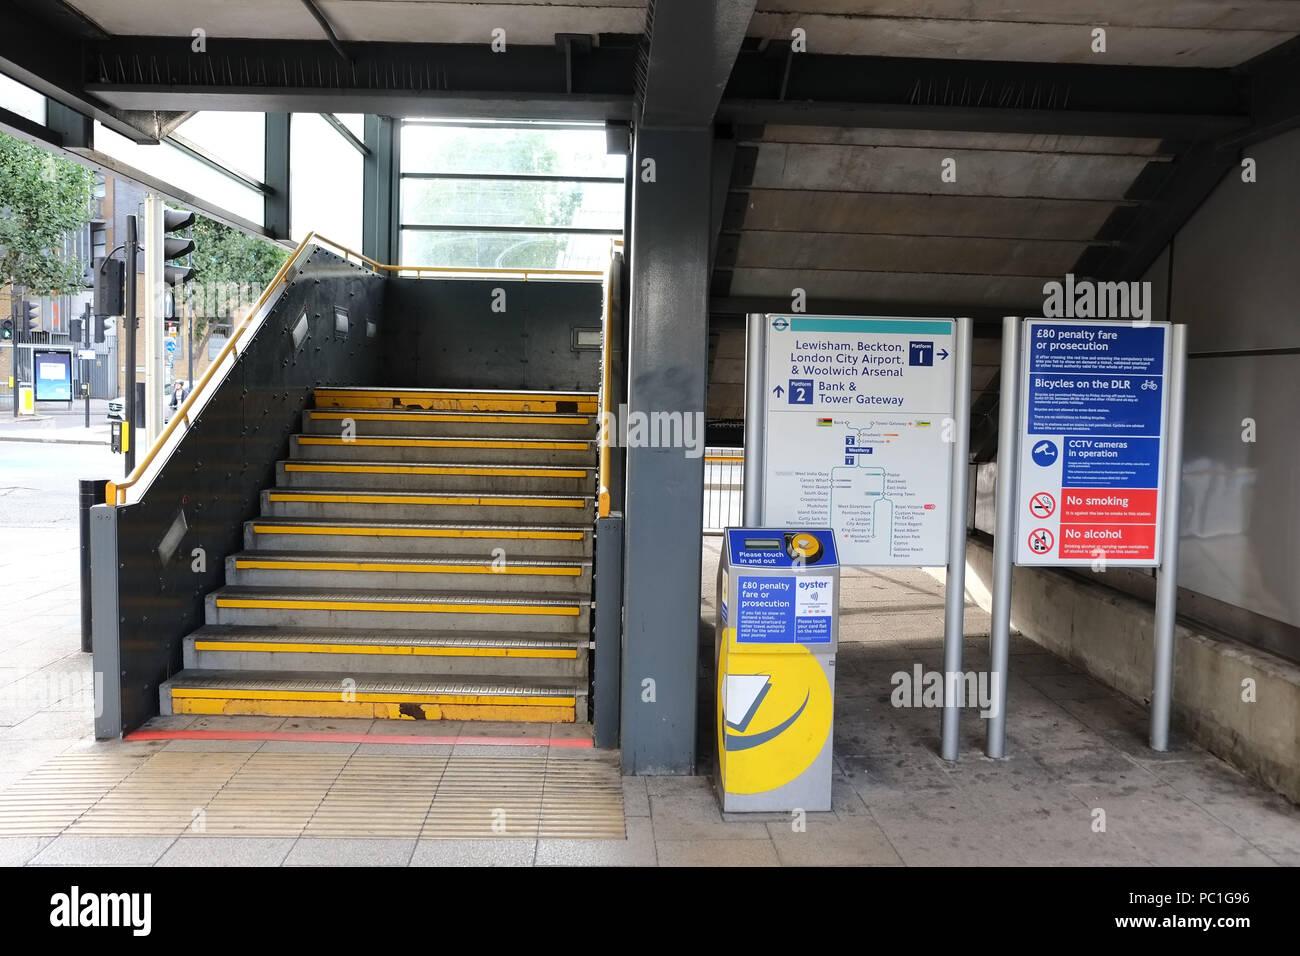 Westferry Docklands Light Railway Station - Stock Image